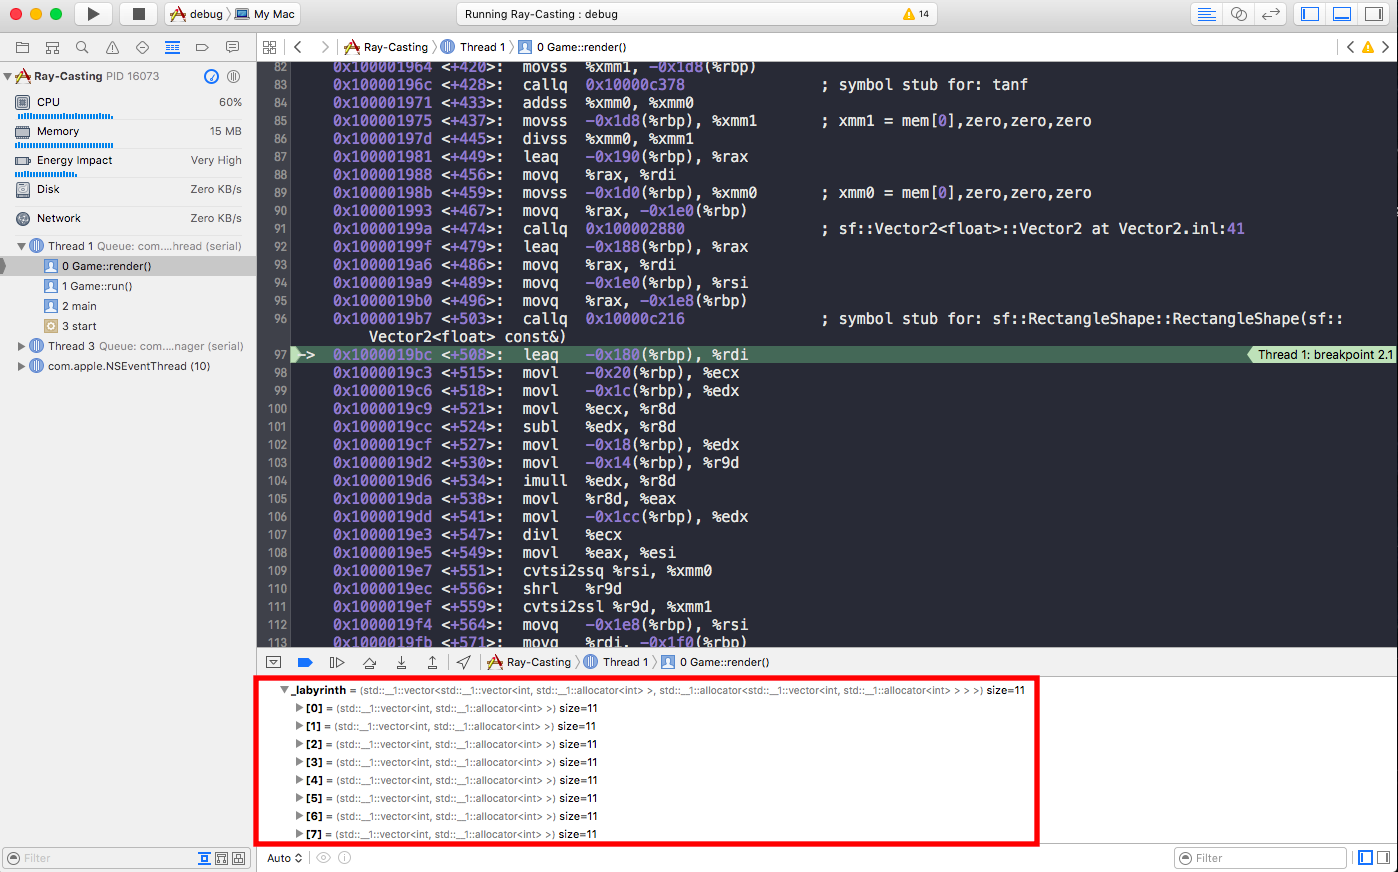 debugger de l'app lancée depuis Xcode